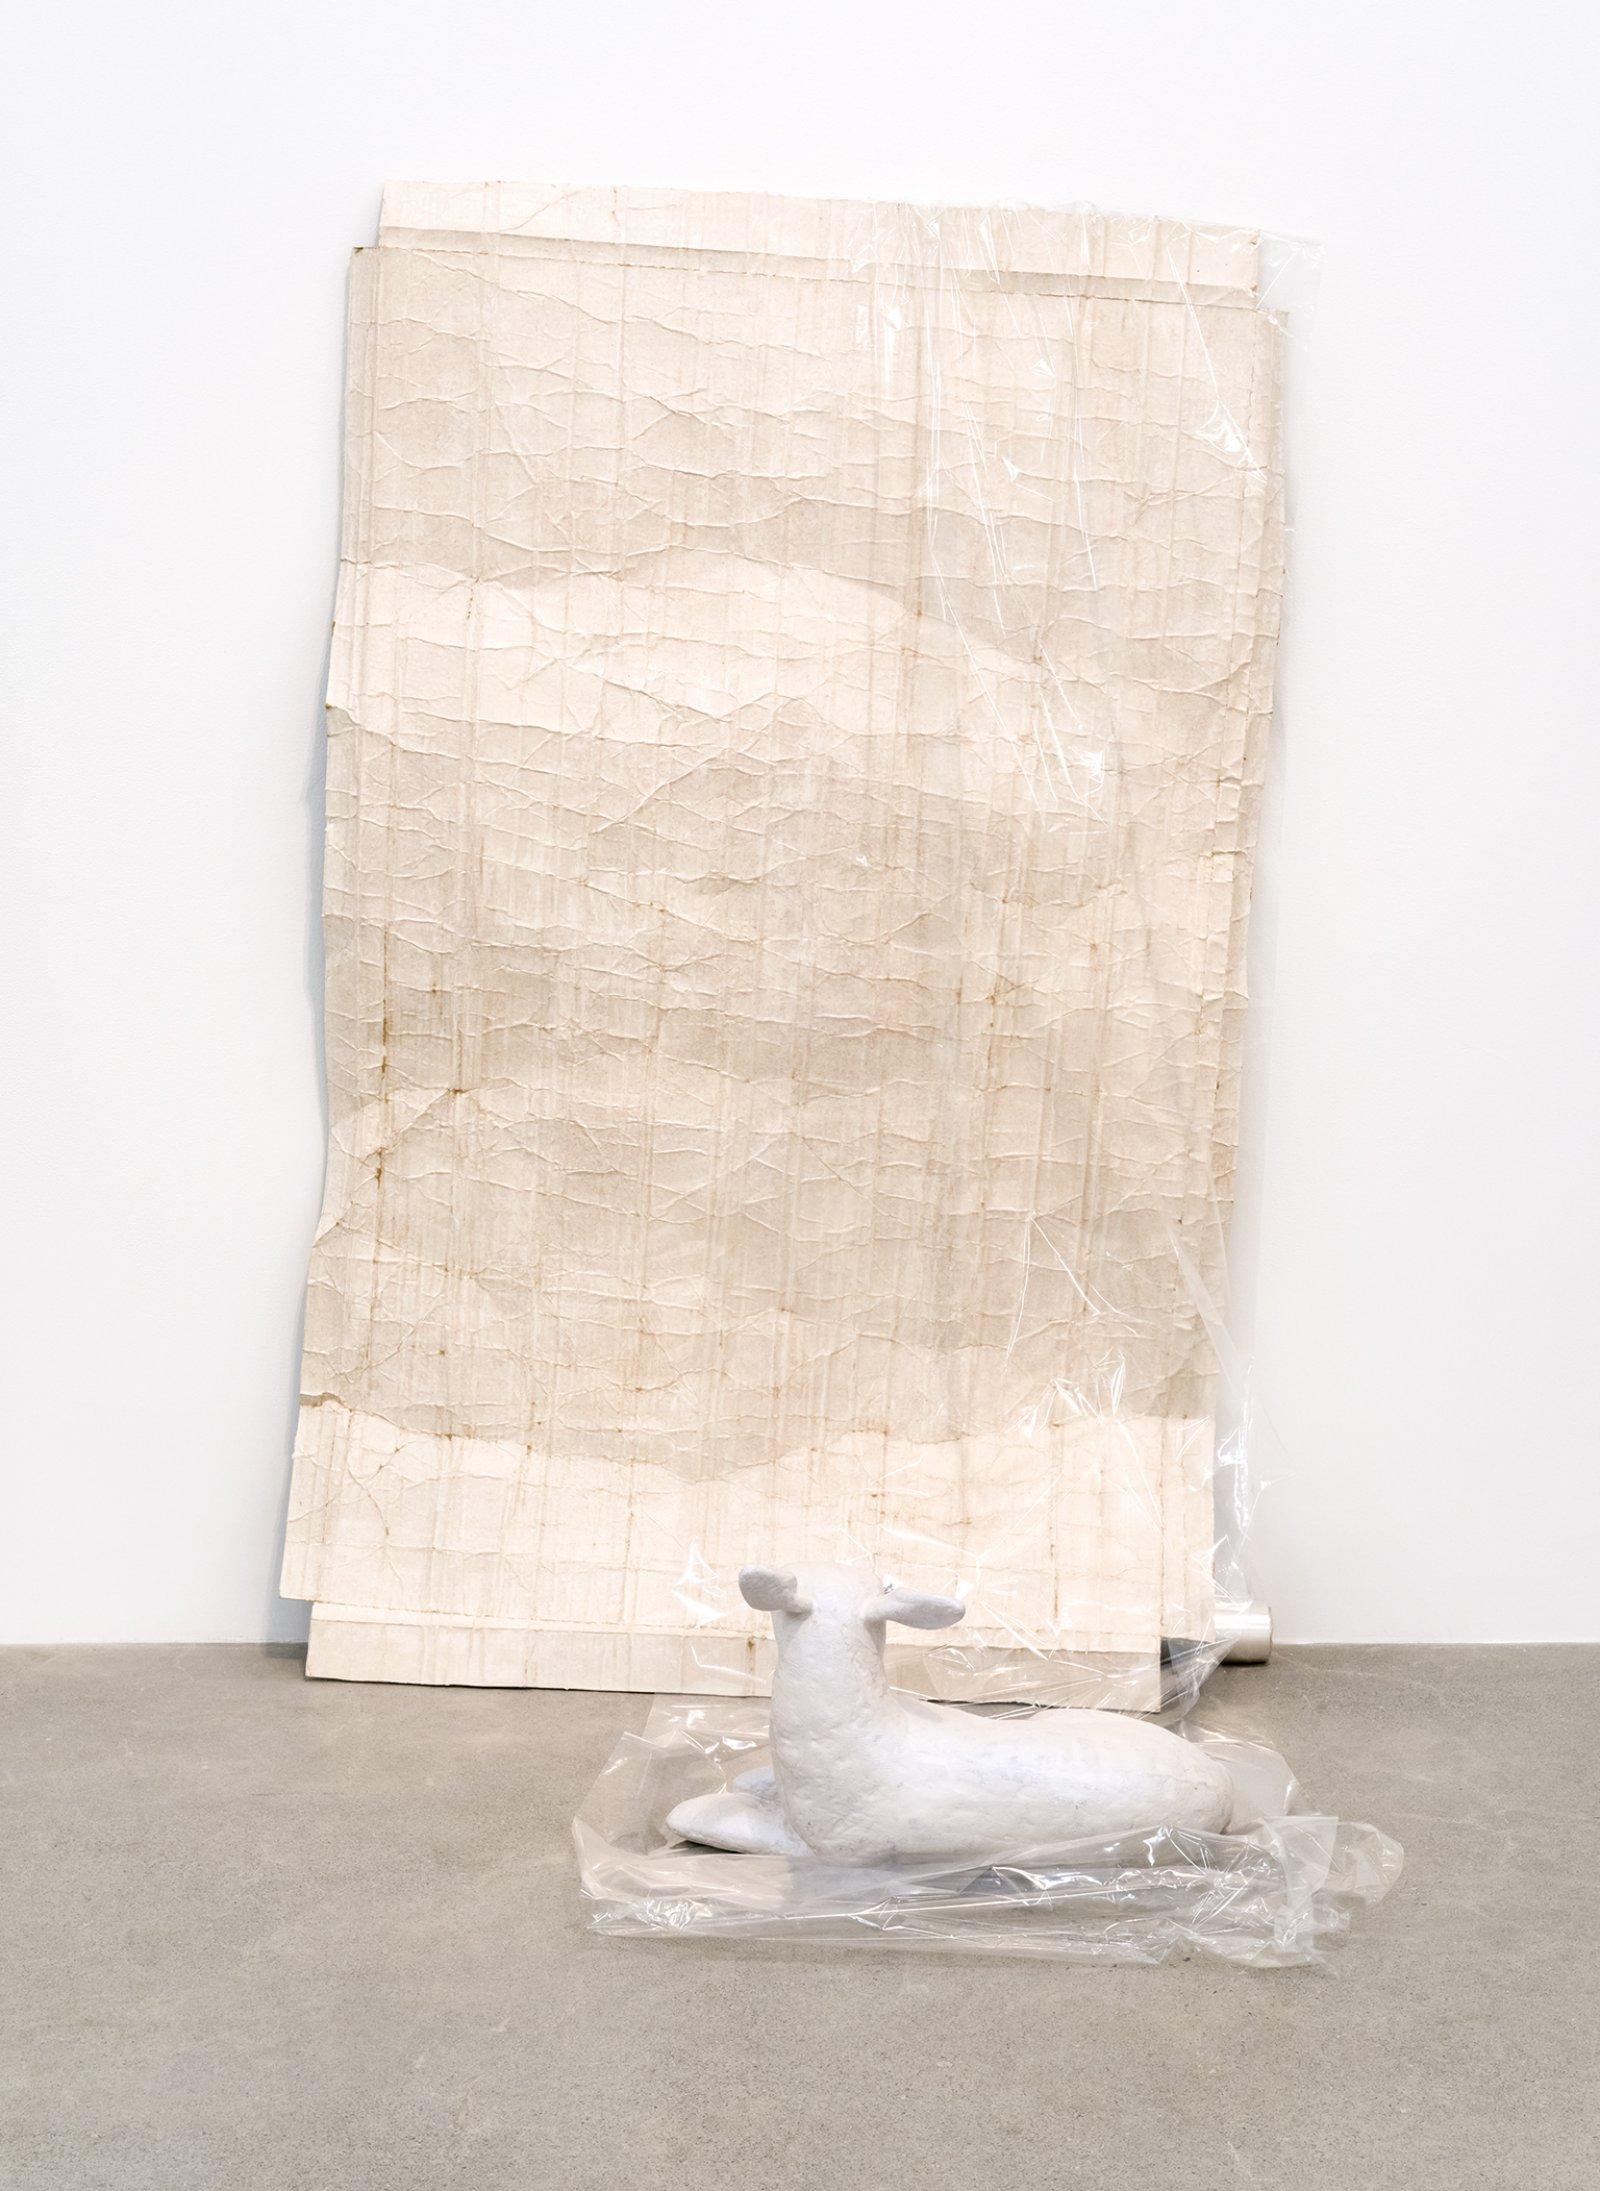 Liz Magor, Attachment, 2016, polymerized gypsum, cellophane, 65 x 43 x 39 in. (165 x 109 x 99 cm) by Liz Magor